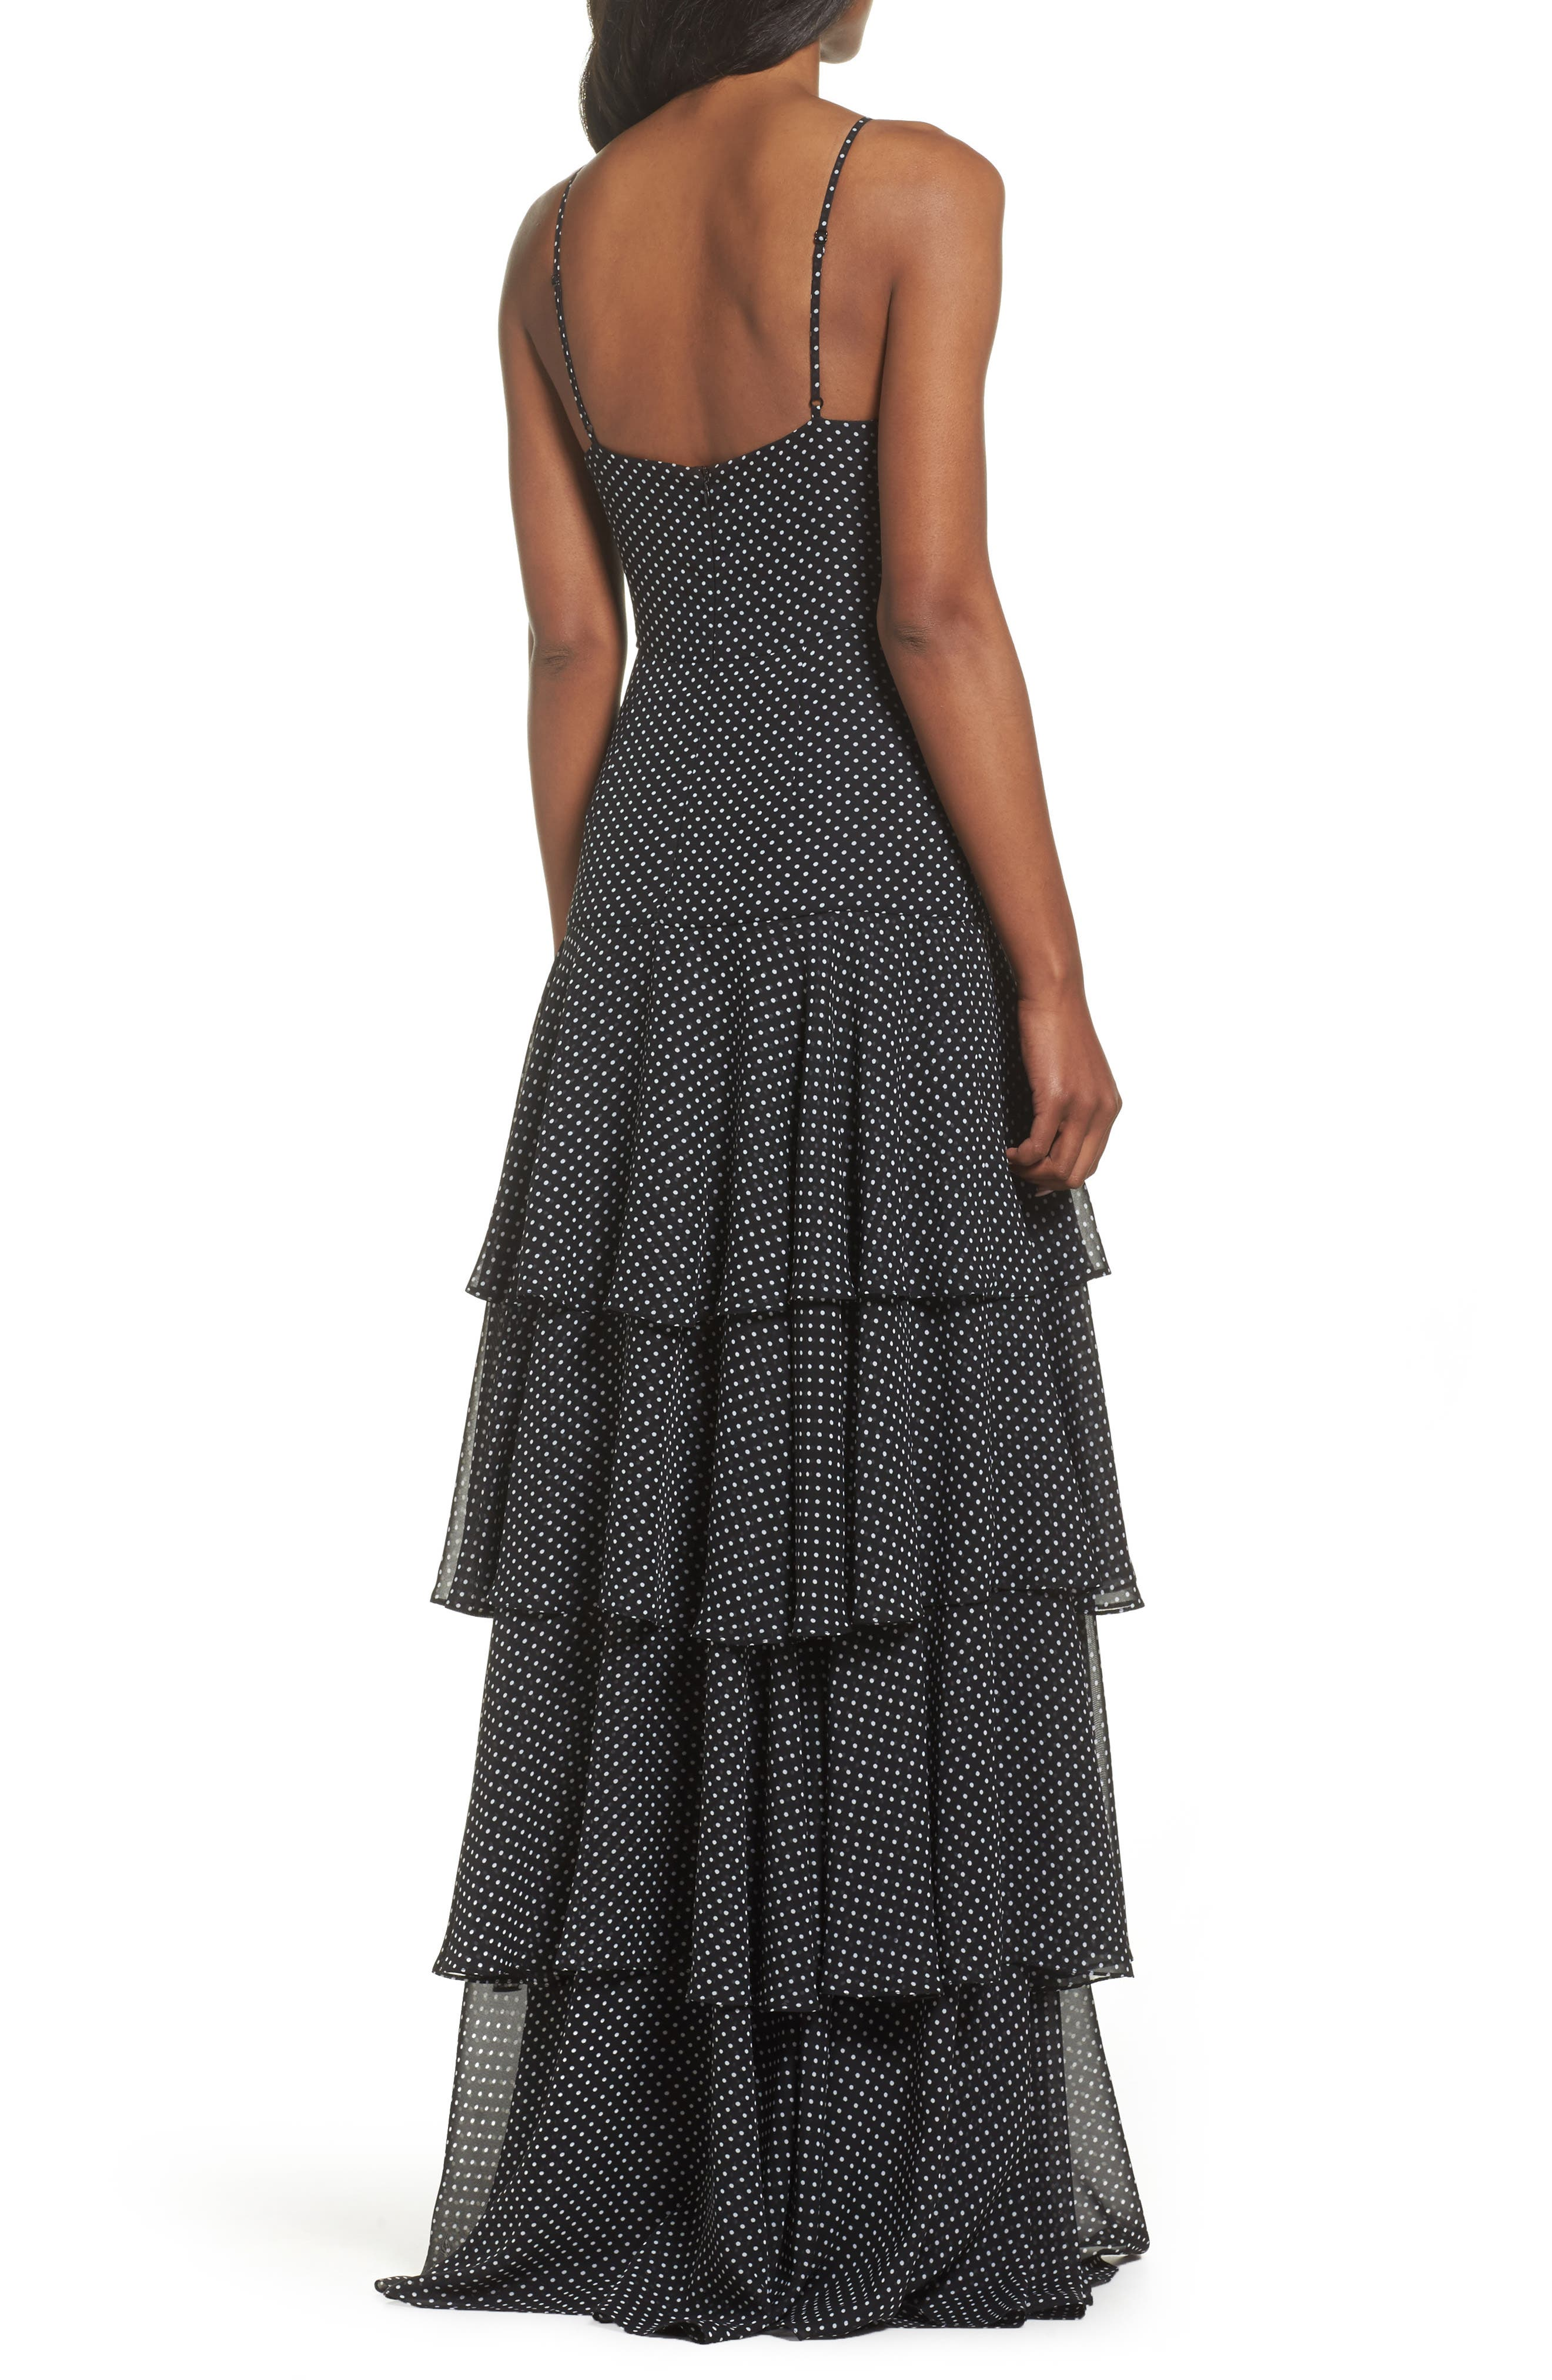 Polka Dot Tiered Gown,                             Alternate thumbnail 3, color,                             Black/ White